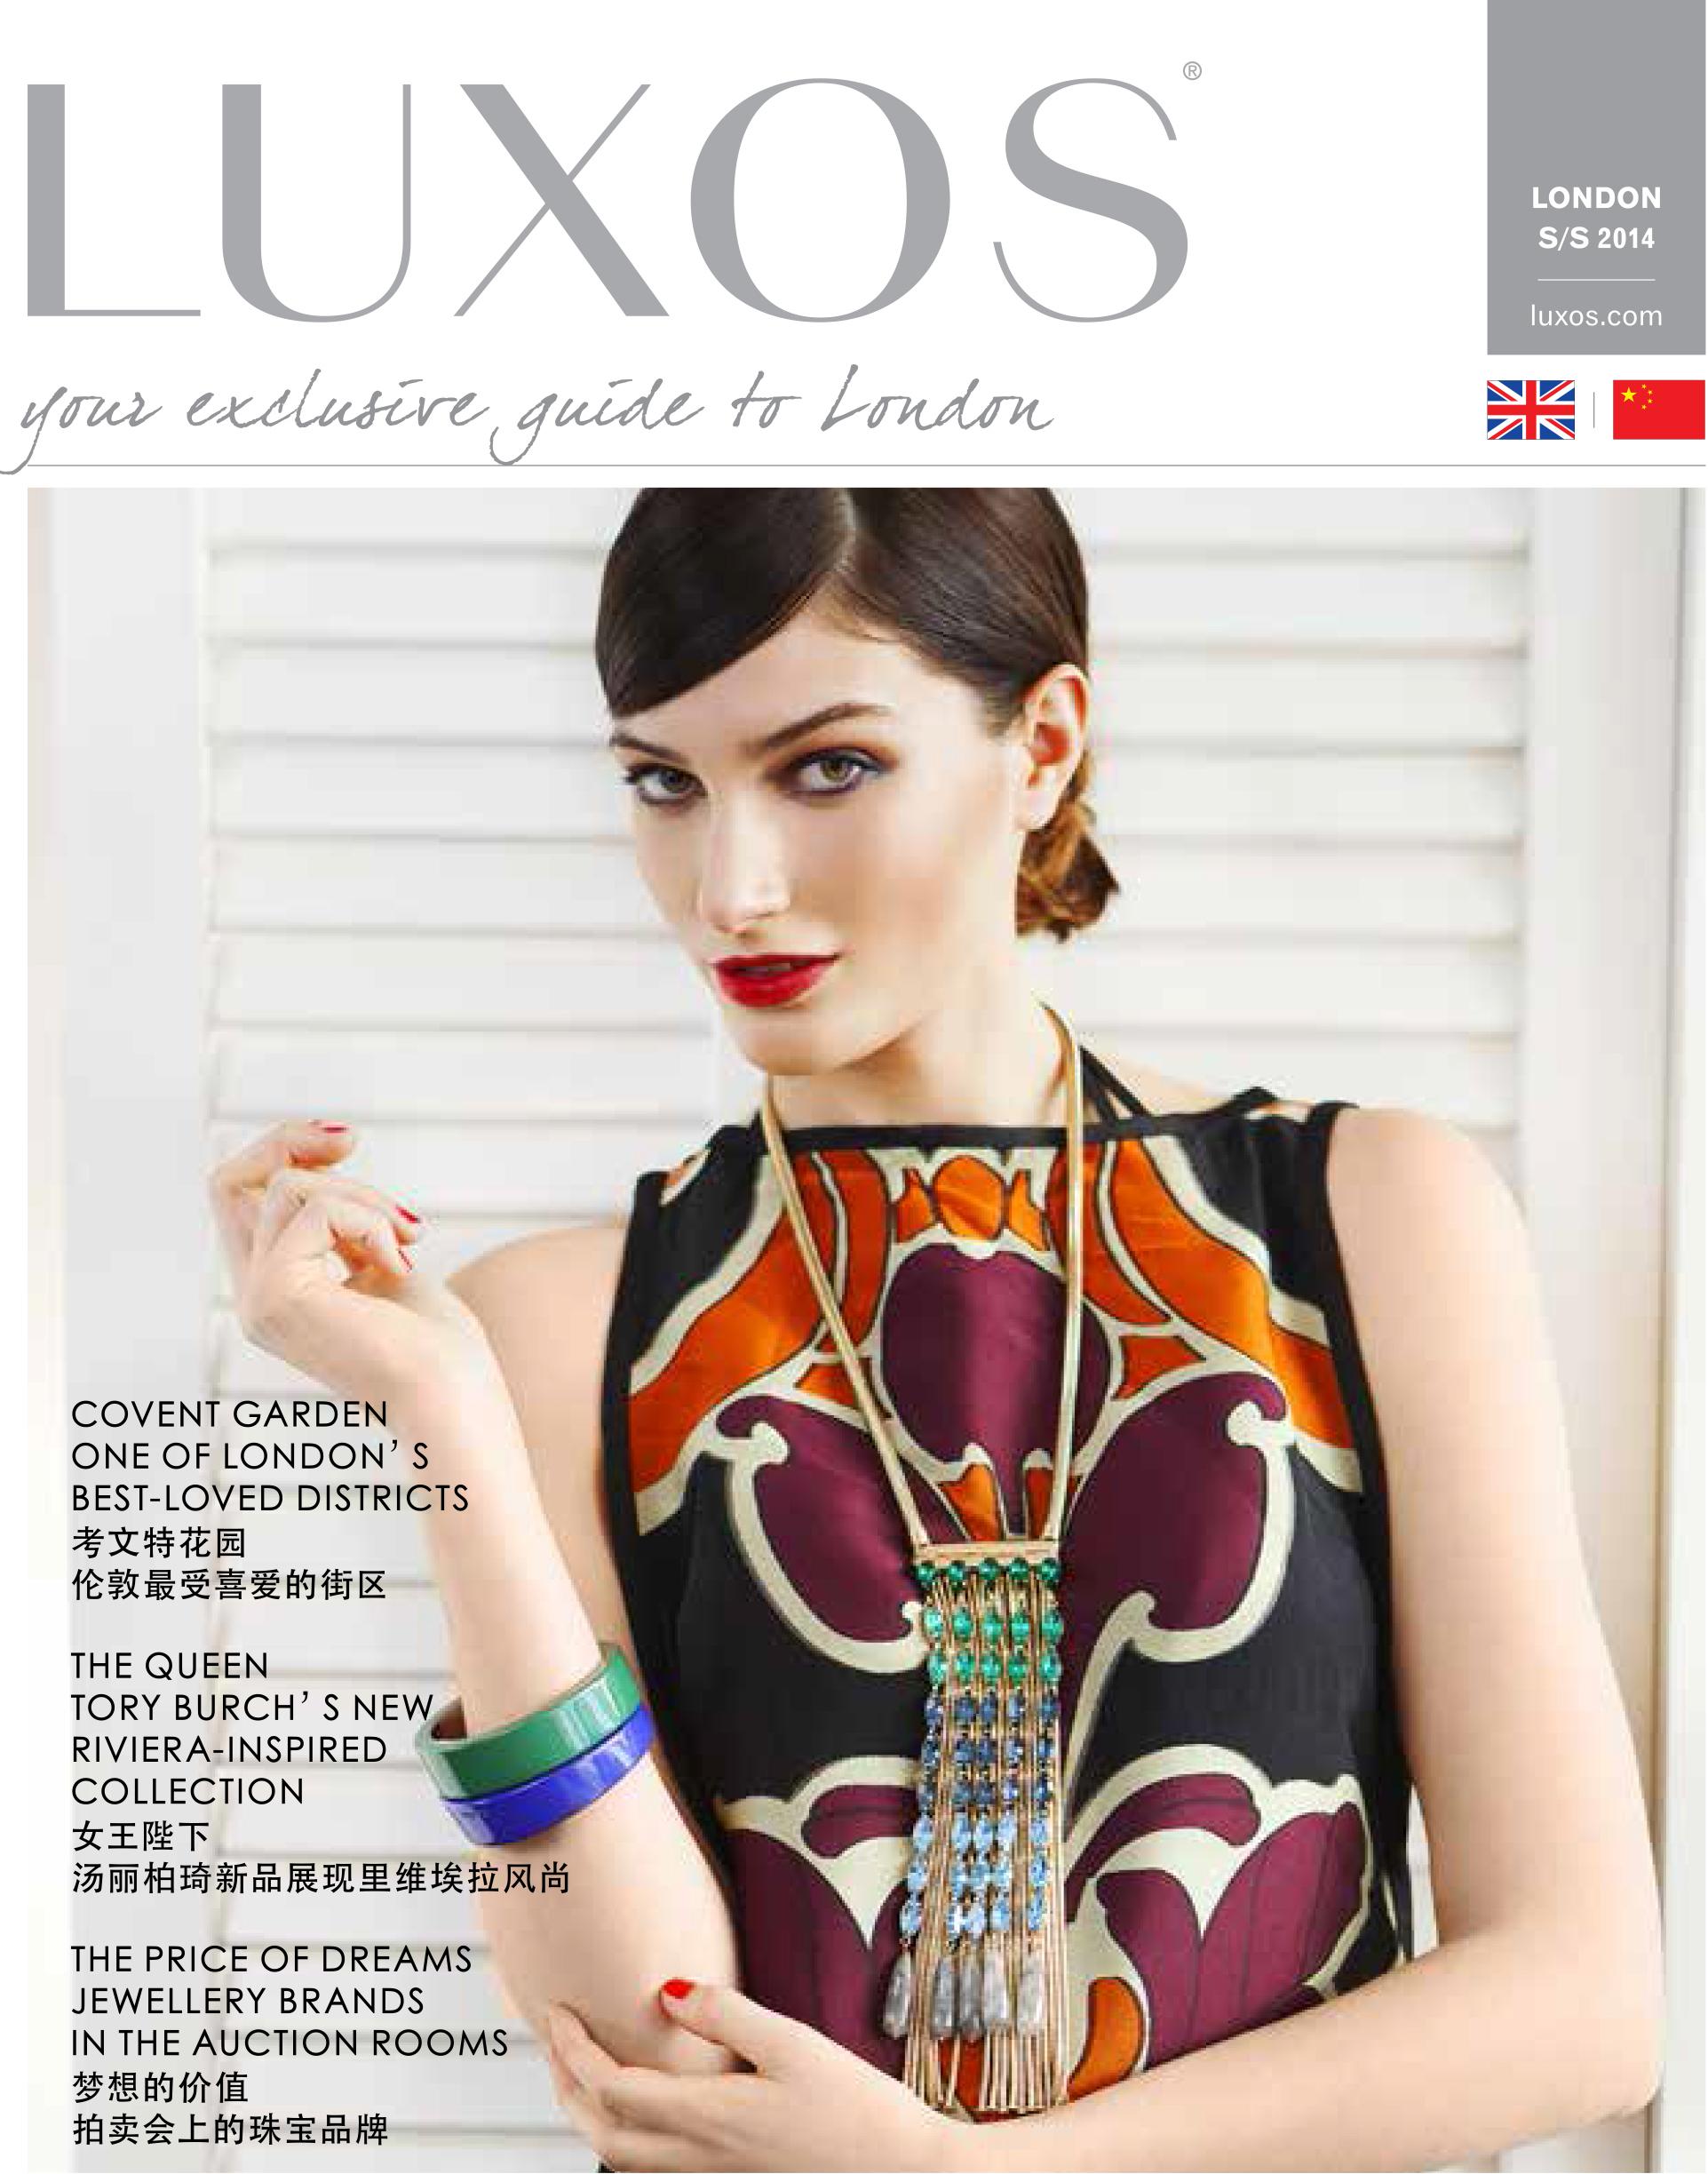 luxos_london_chinese_ss2014-1a.jpg